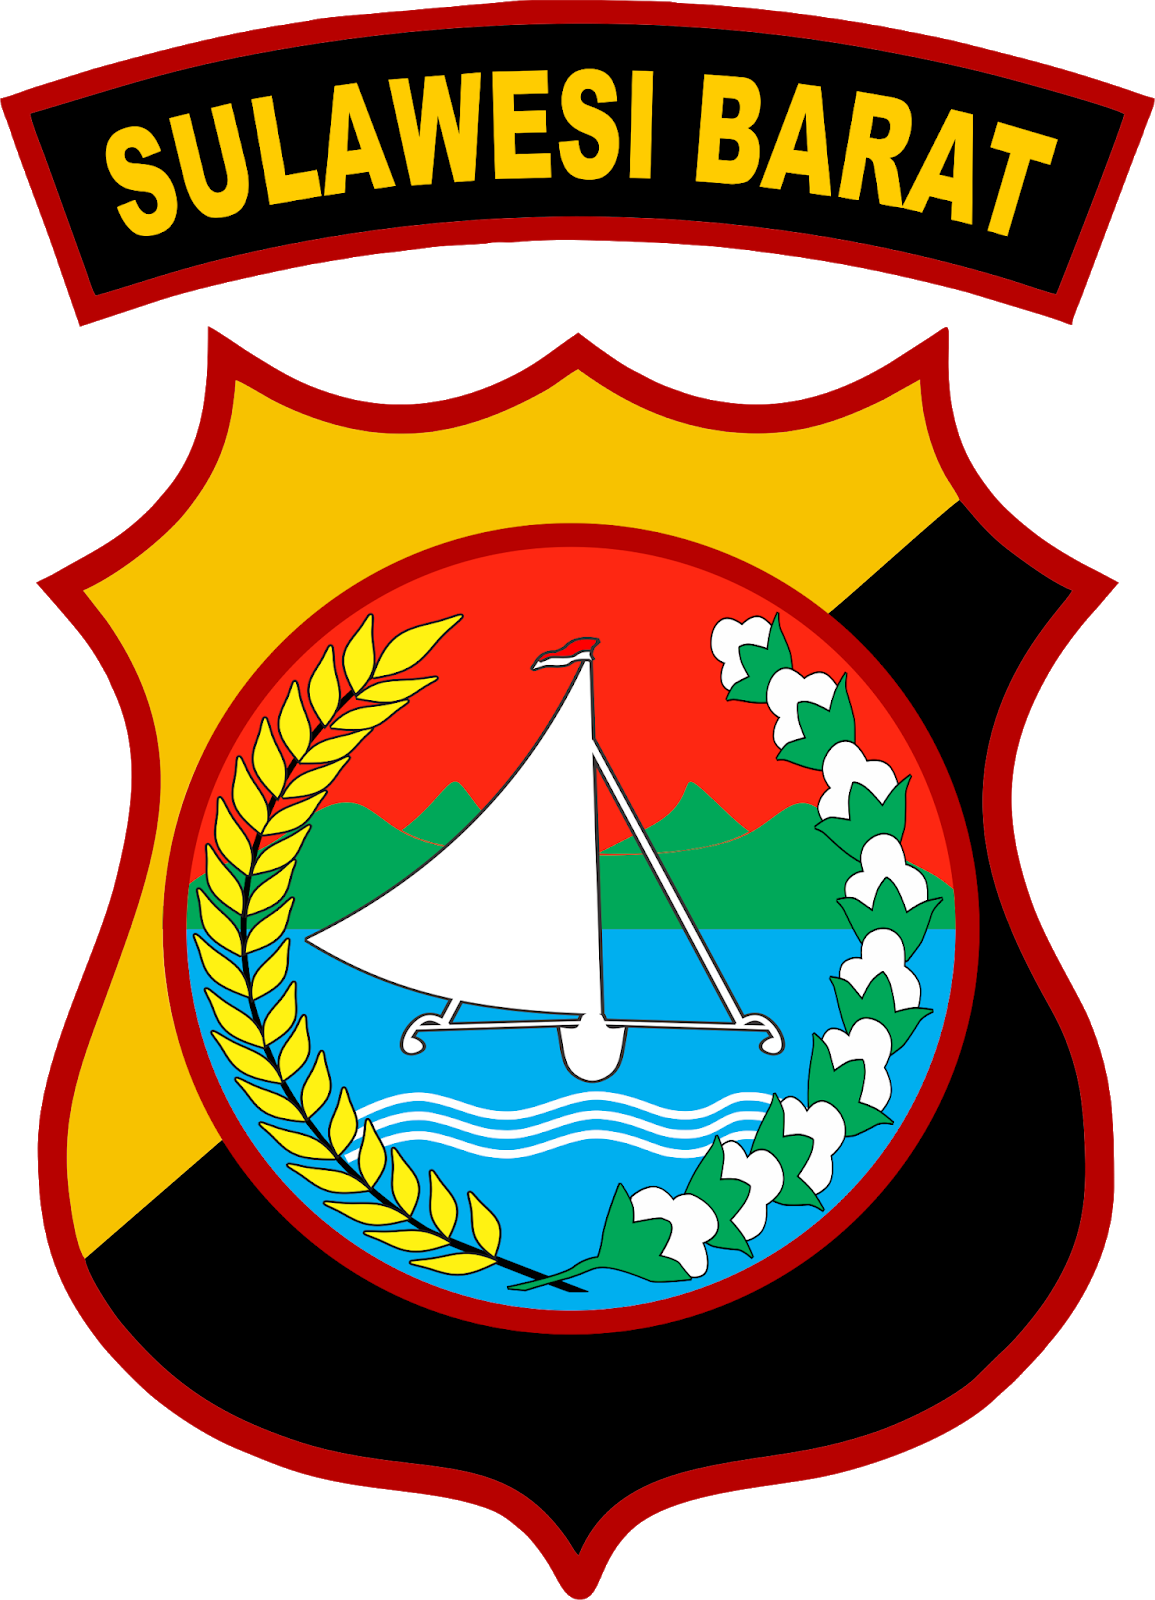 Kepolisian Daerah Sulawesi Barat Wikipedia Bahasa Indonesia Ensiklopedia Bebas